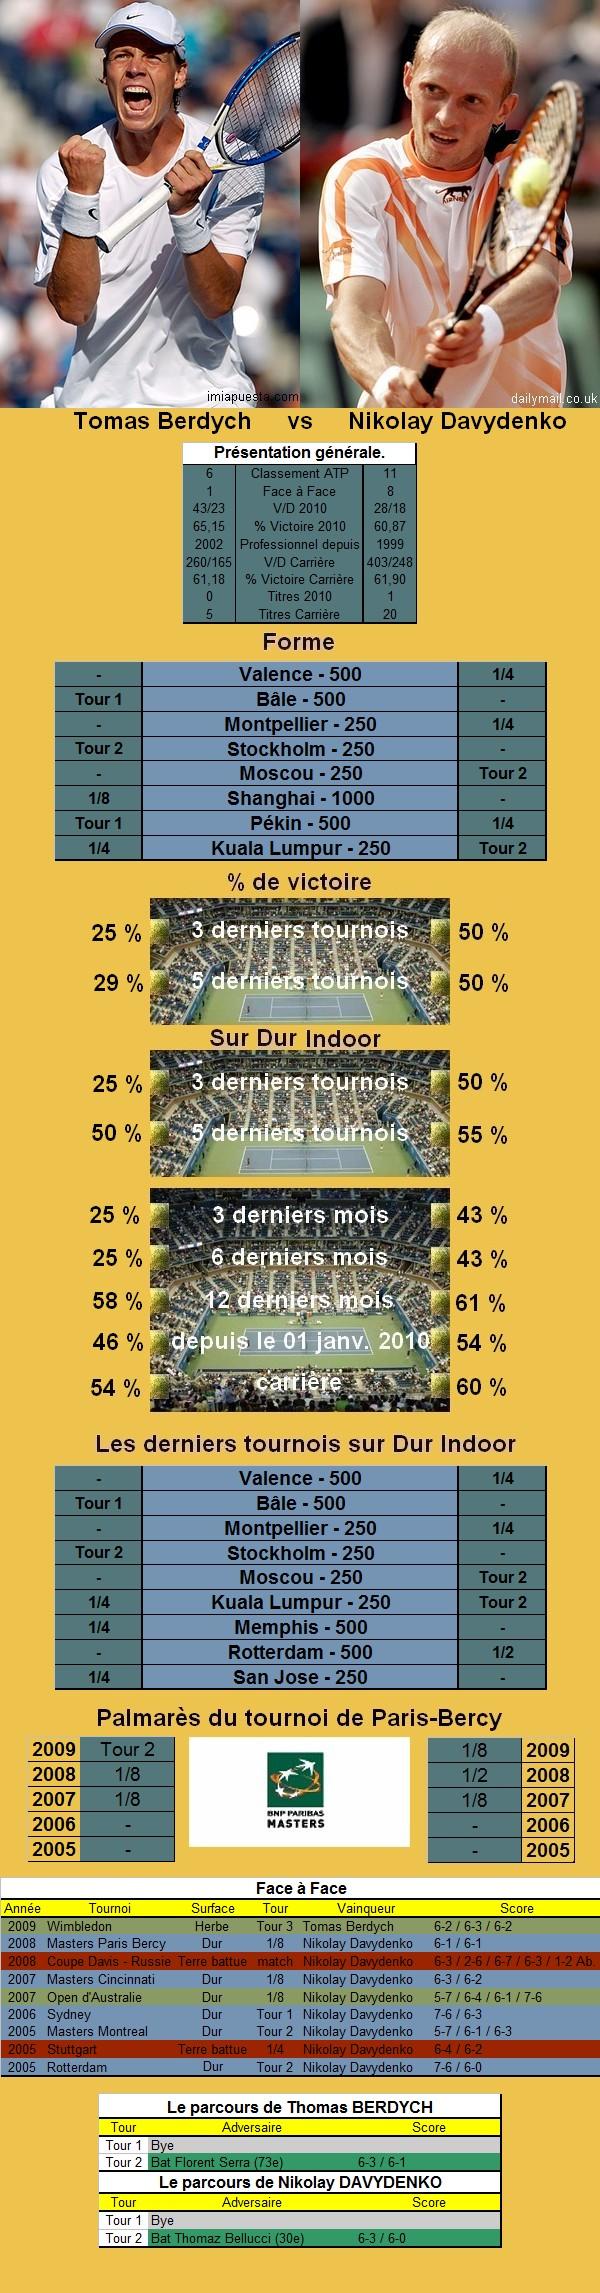 Statistiques tennis de Berdych contre Davydenko à Paris Bercy